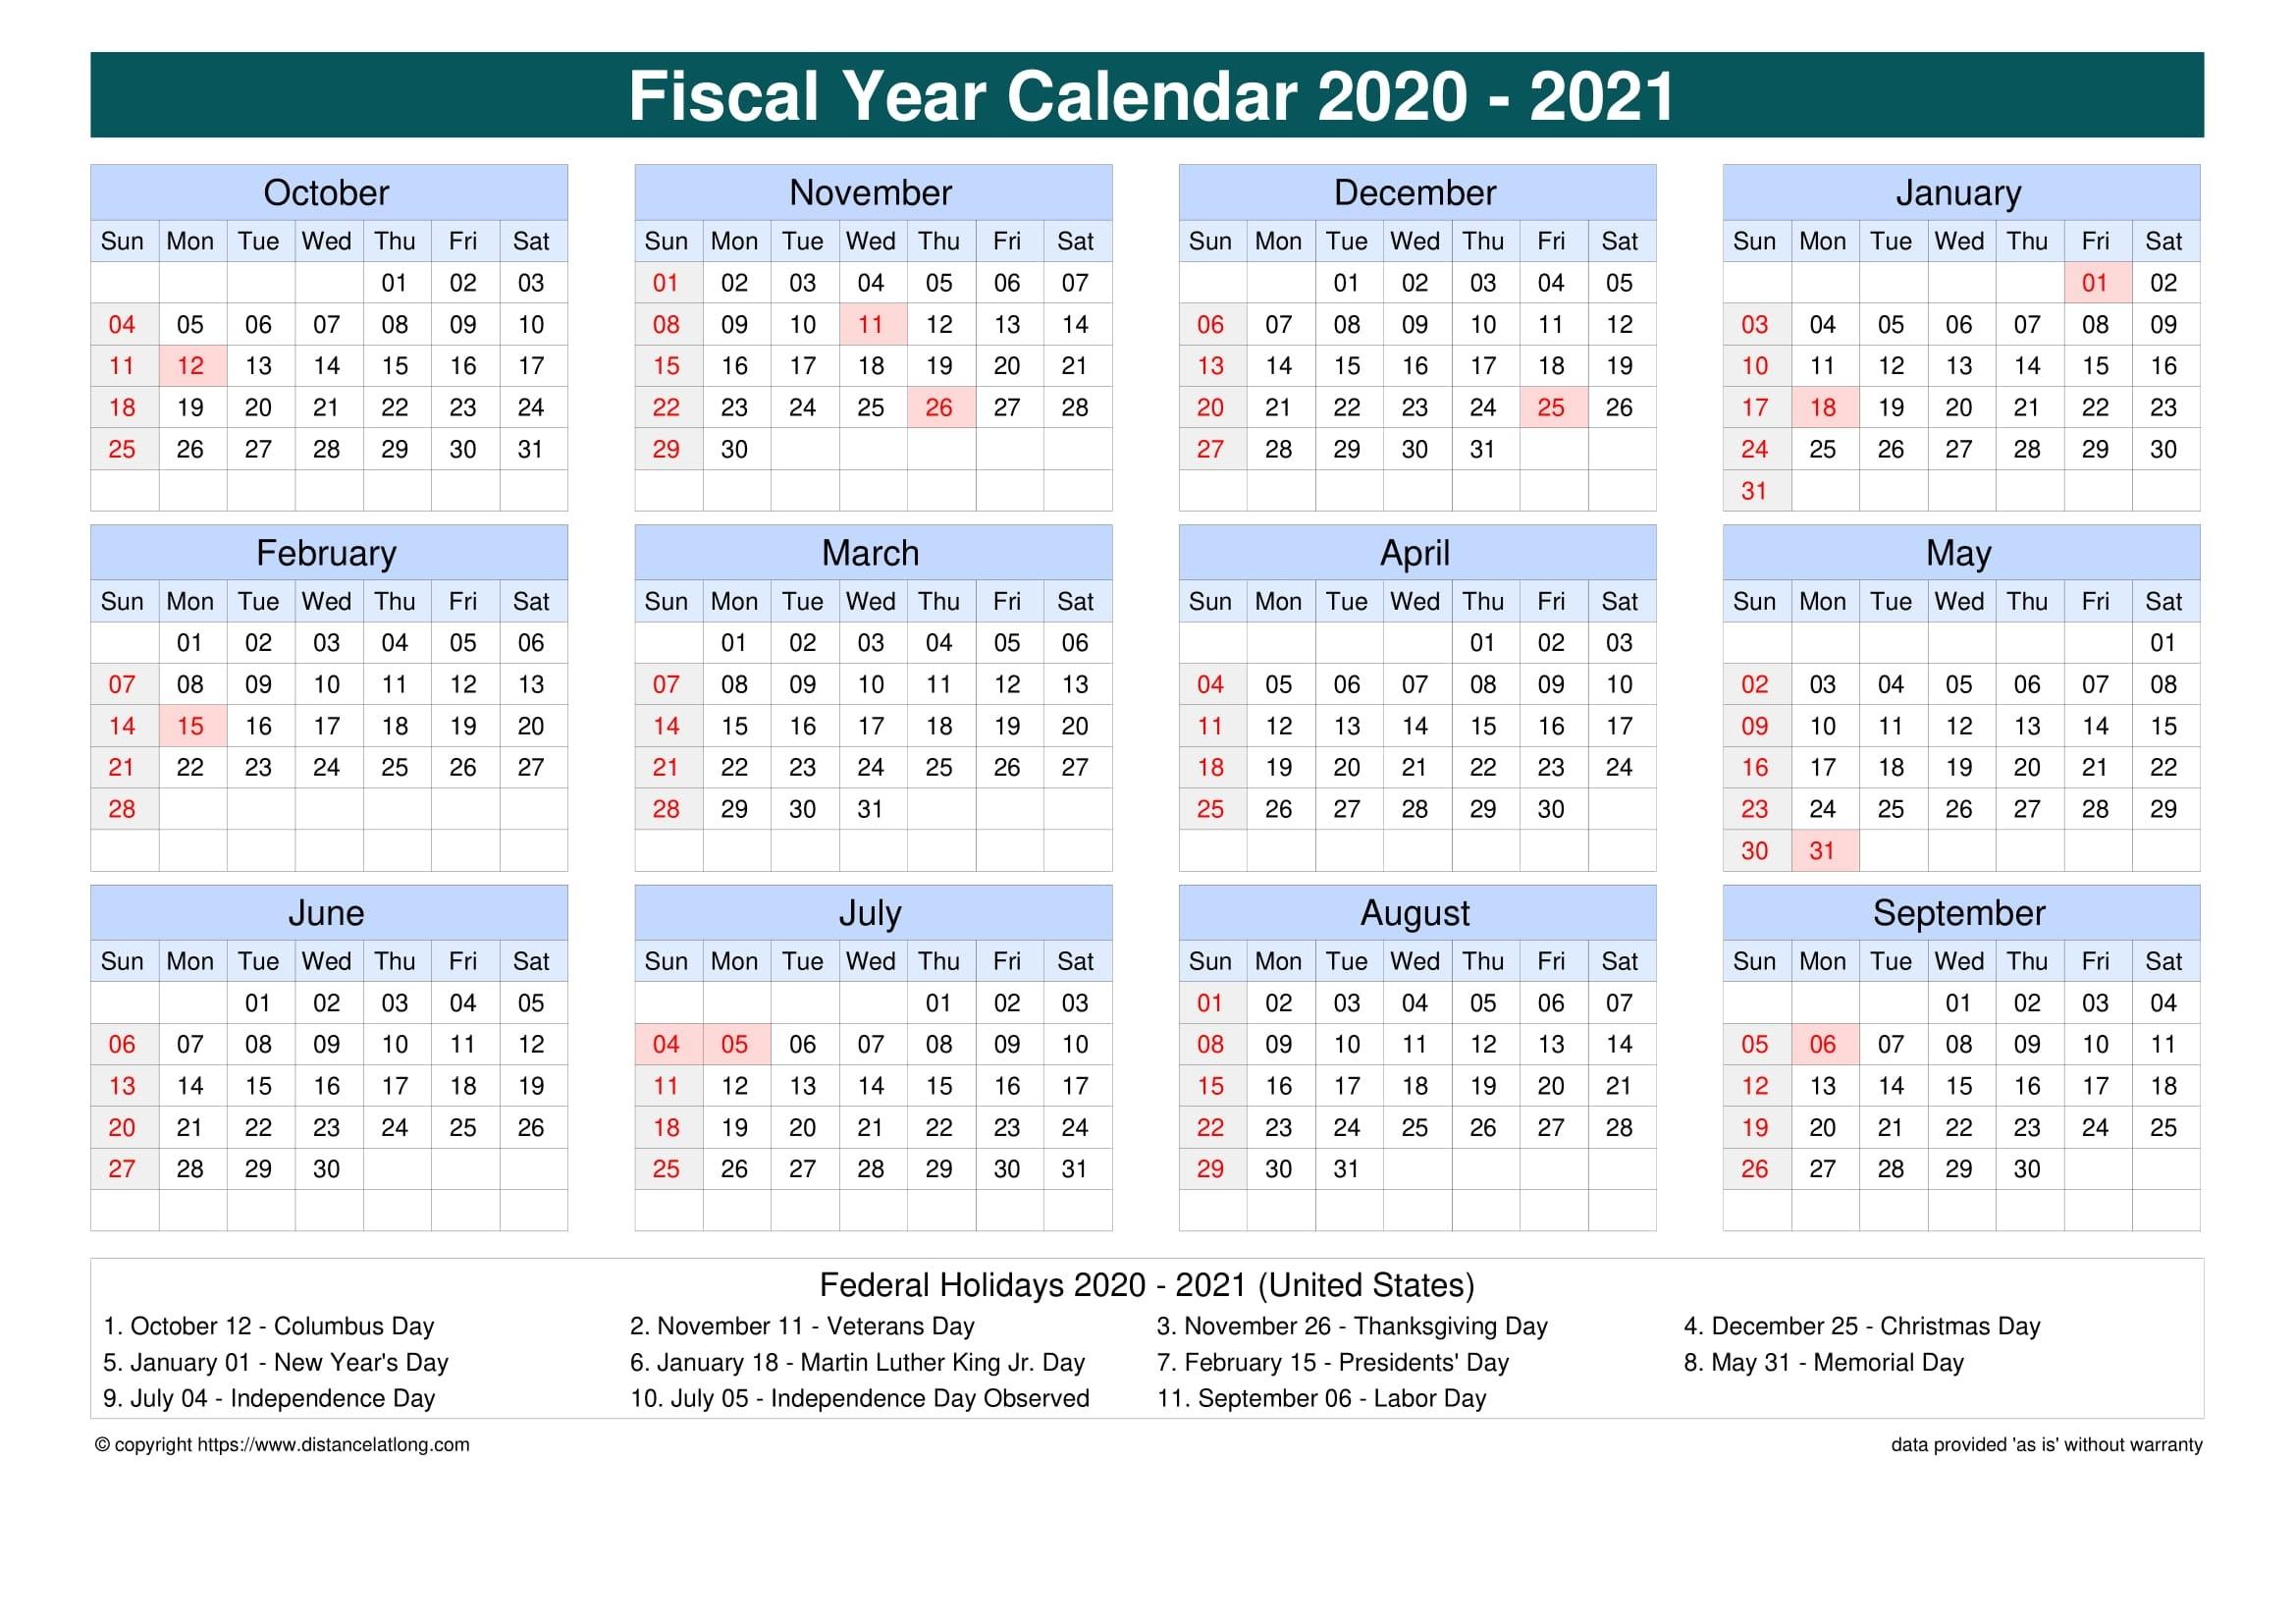 2020 Australia Holiday Calendar Australia Portrait  Australia What Are The Dates For The 18/19 Financial Year